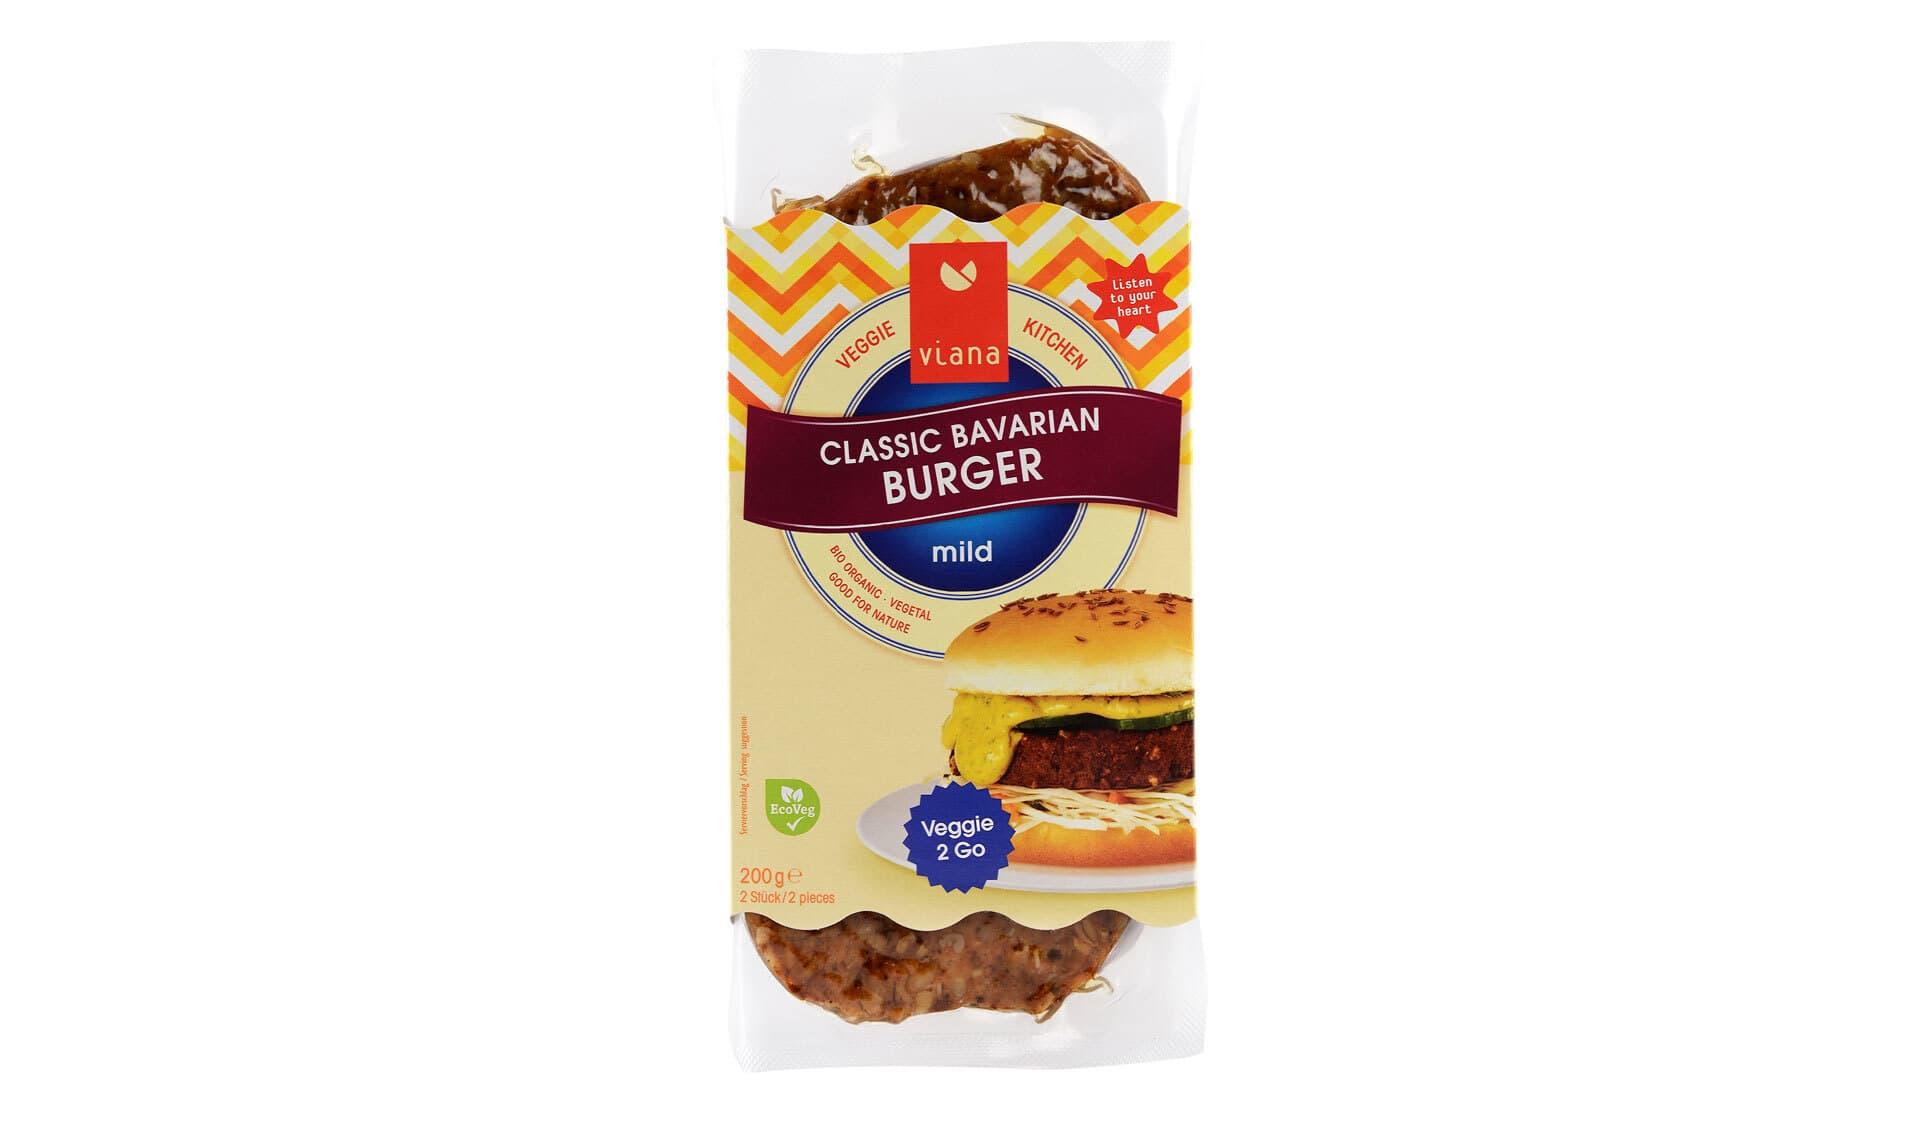 Viana Classic Bavarian Burger